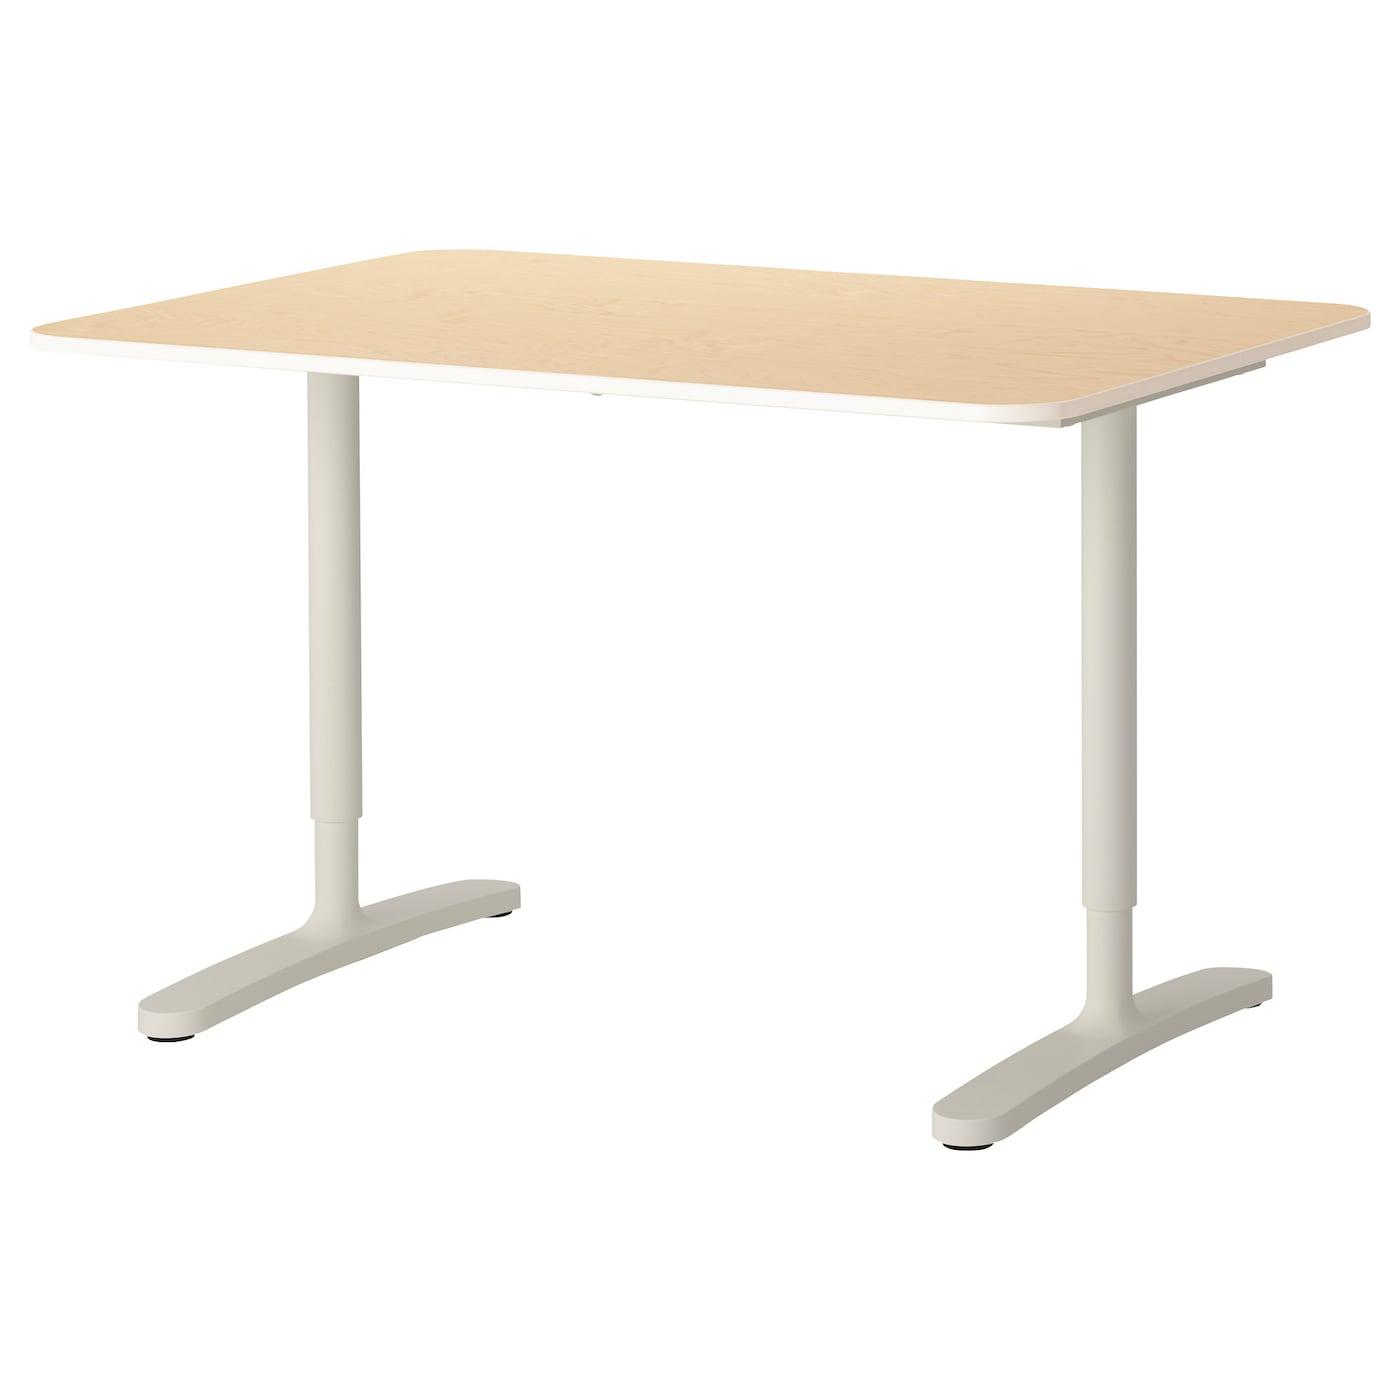 BEKANT Desk Birch veneerwhite 120x80 cm IKEA